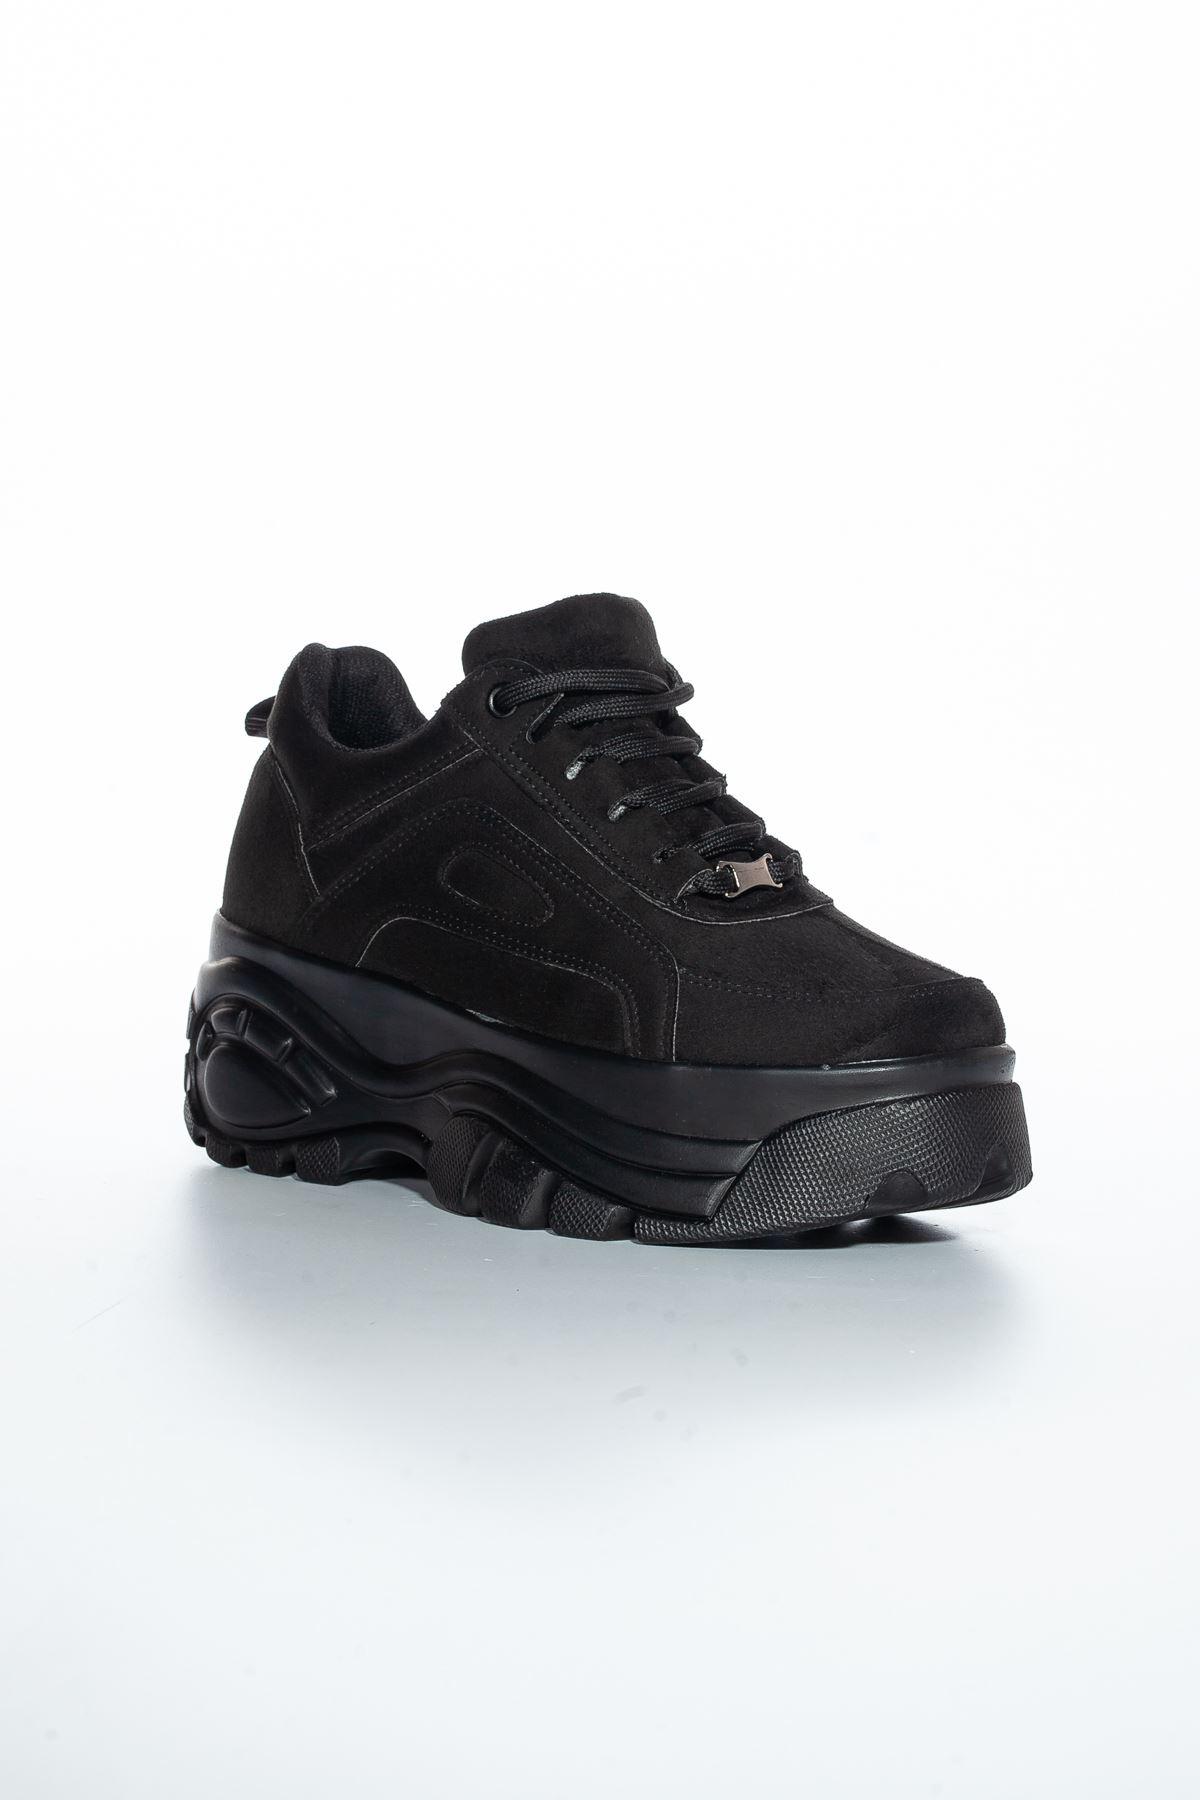 Chris Yüksek Topuk Süet Spor Ayakkabı Siyah